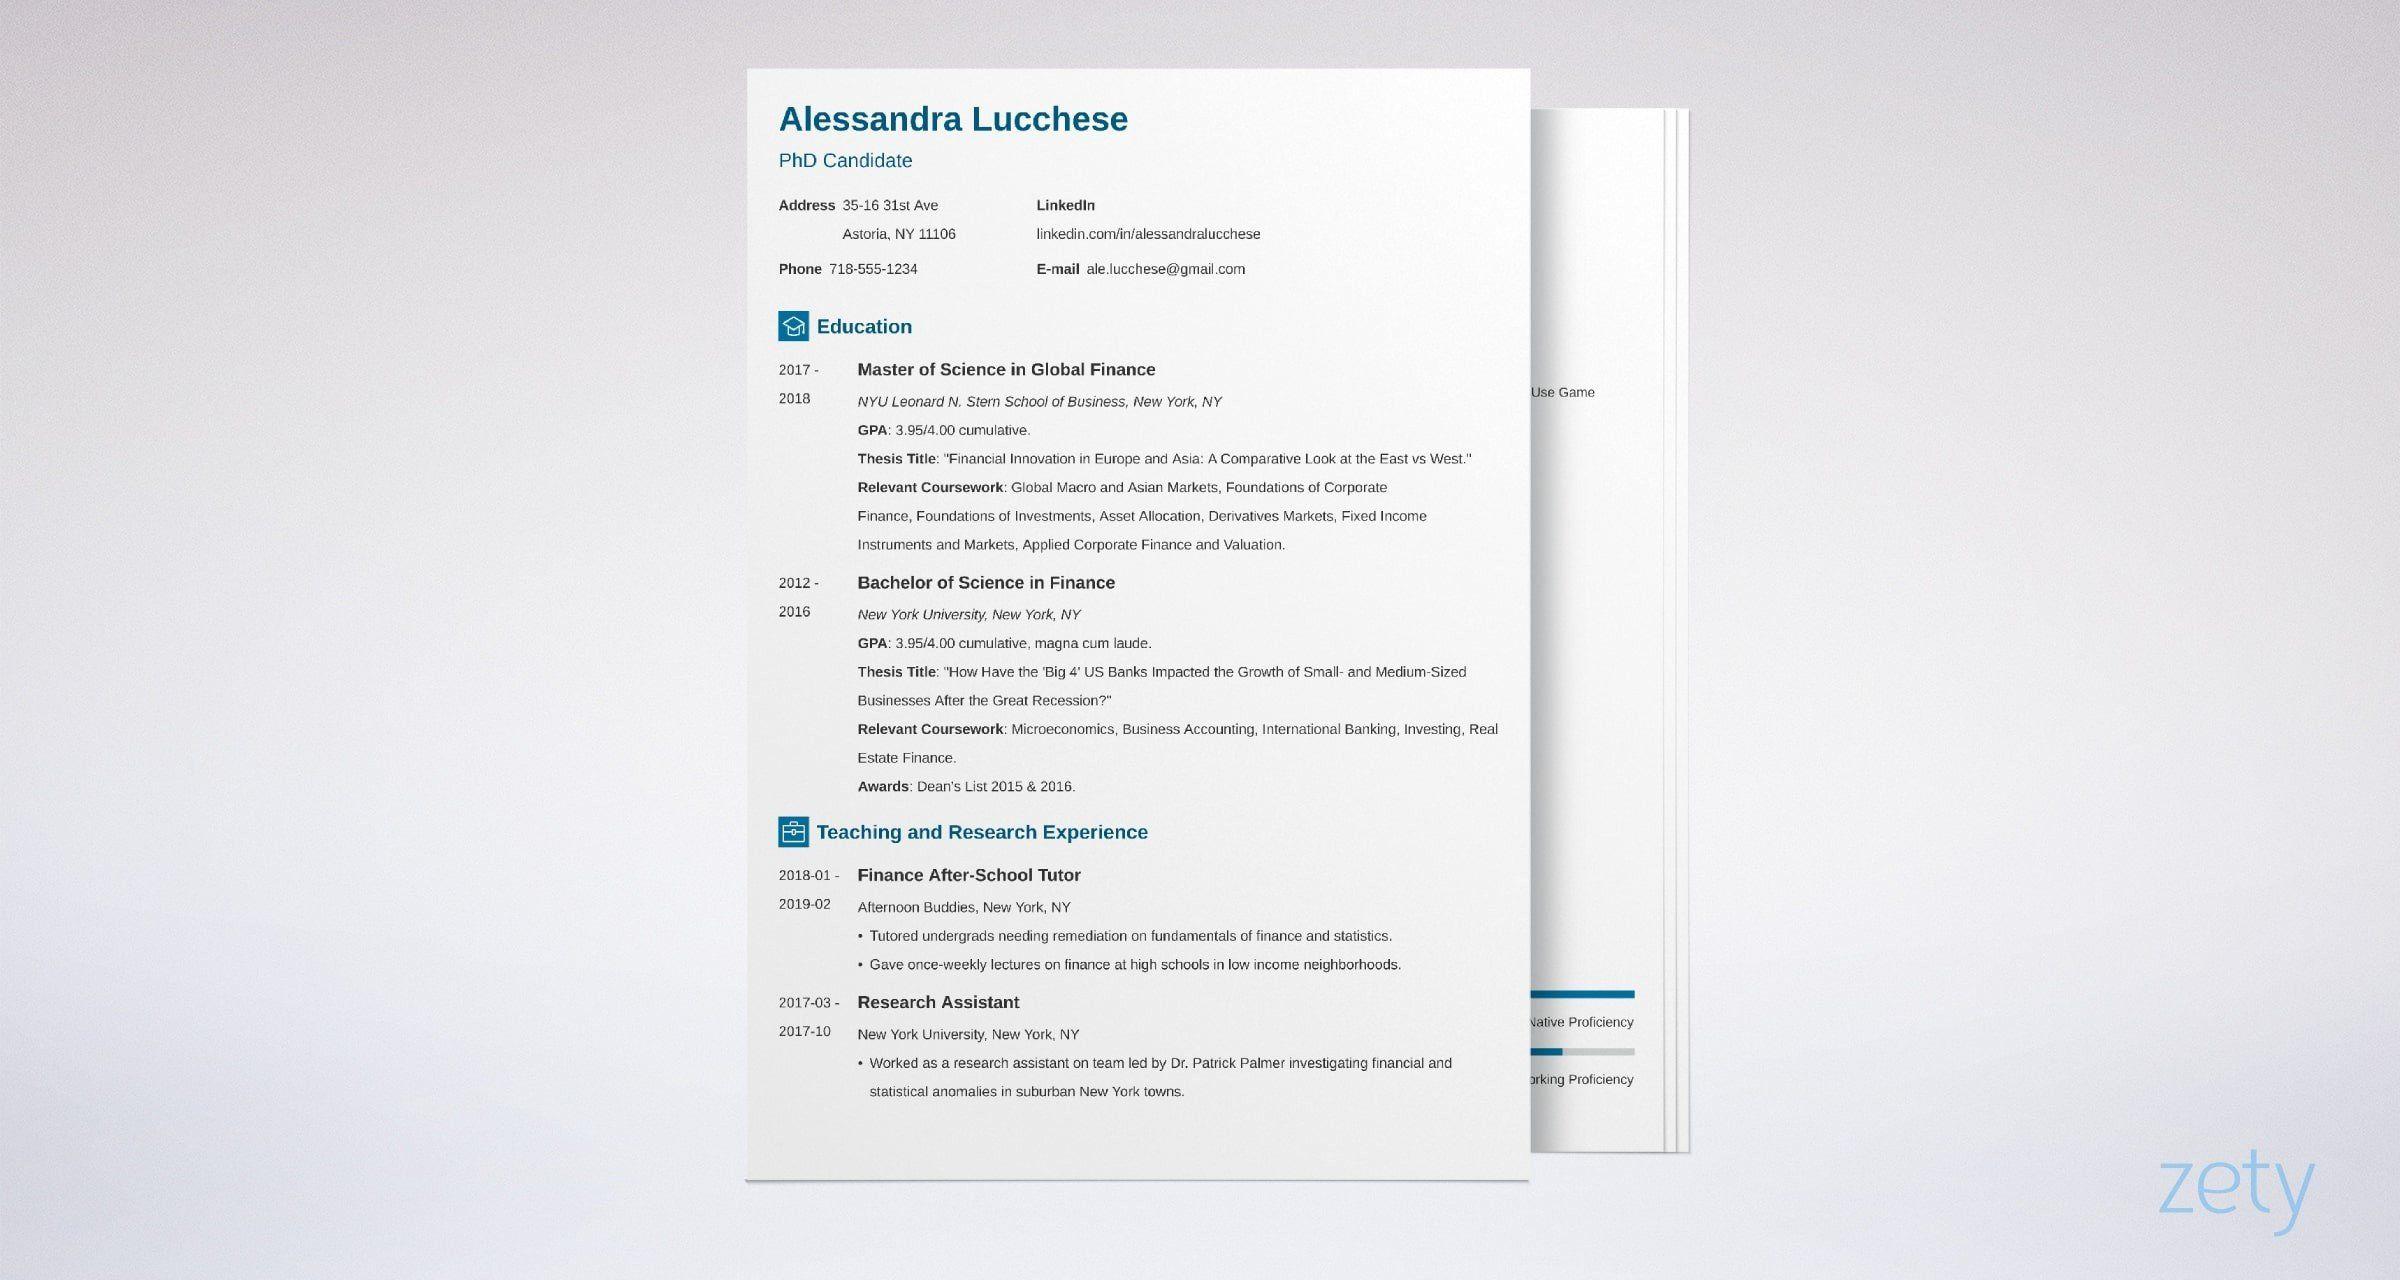 007 Impressive Grad School Resume Template Example  Application Cv Graduate For AdmissionFull